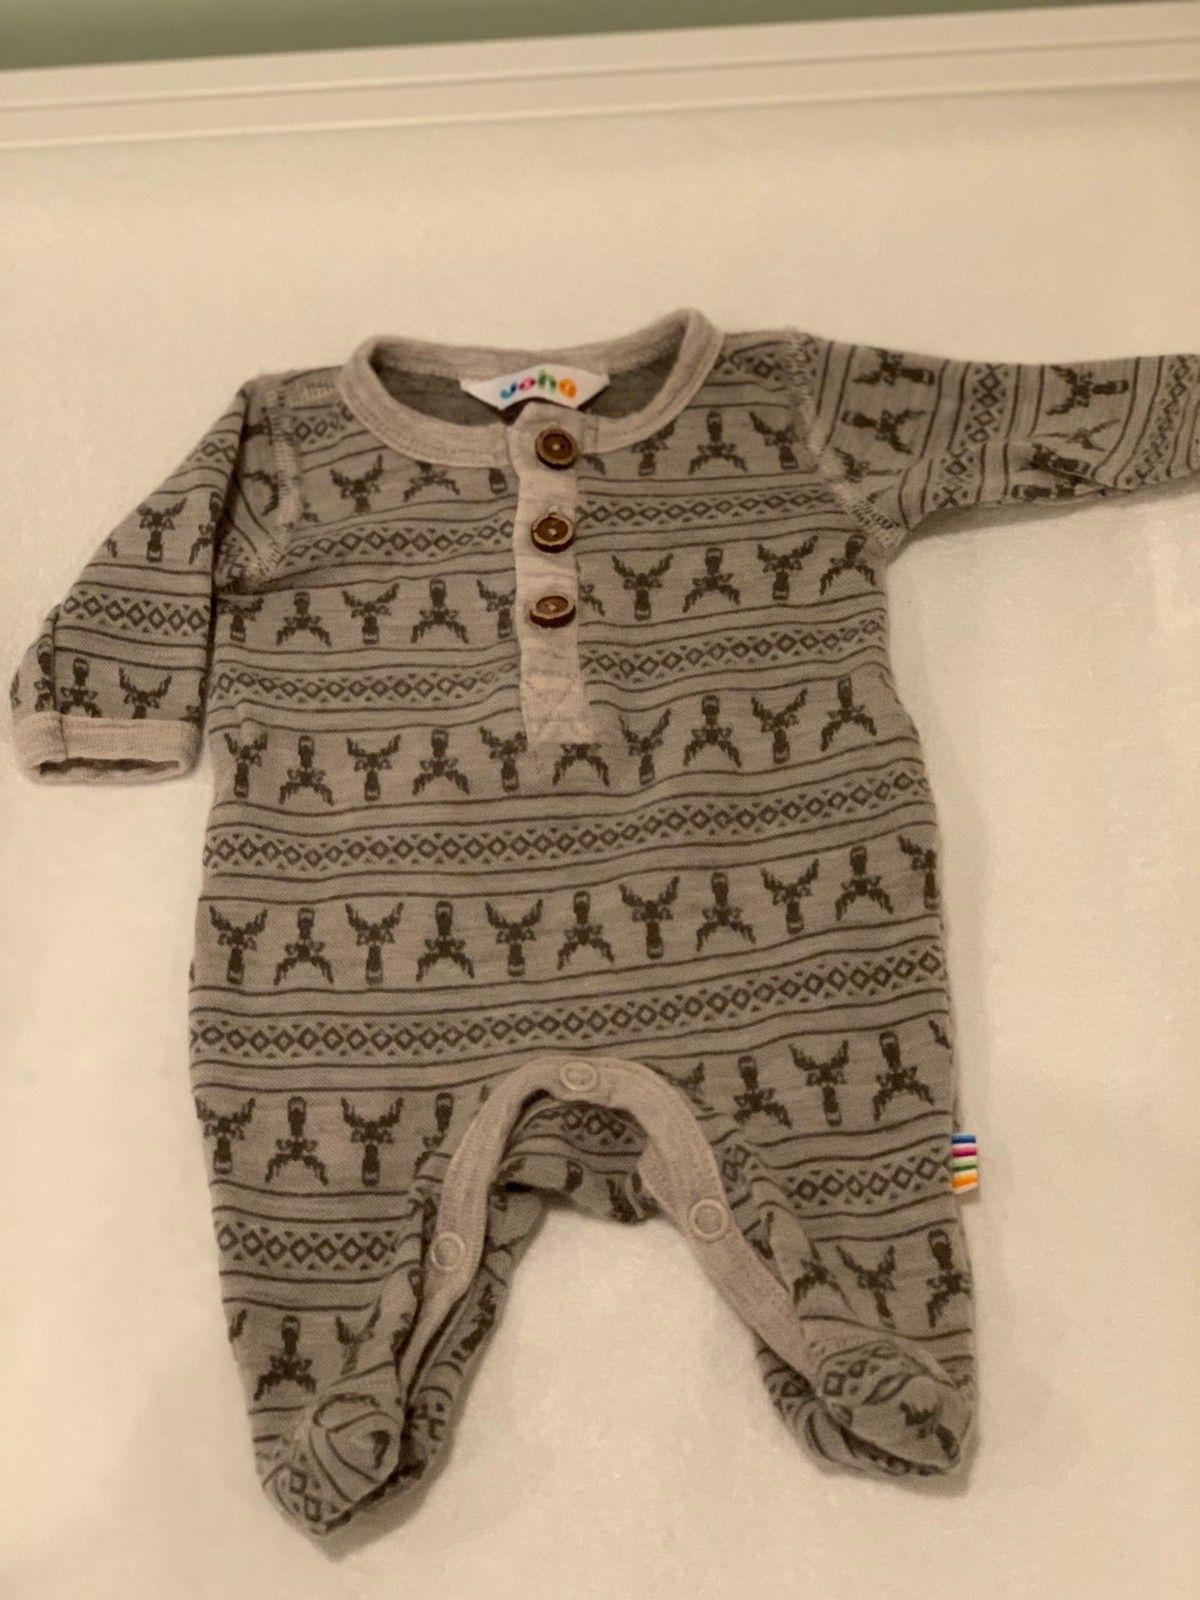 d4dac925 Klær til gutt str. 40-44 (prematur/ liten baby) | FINN.no